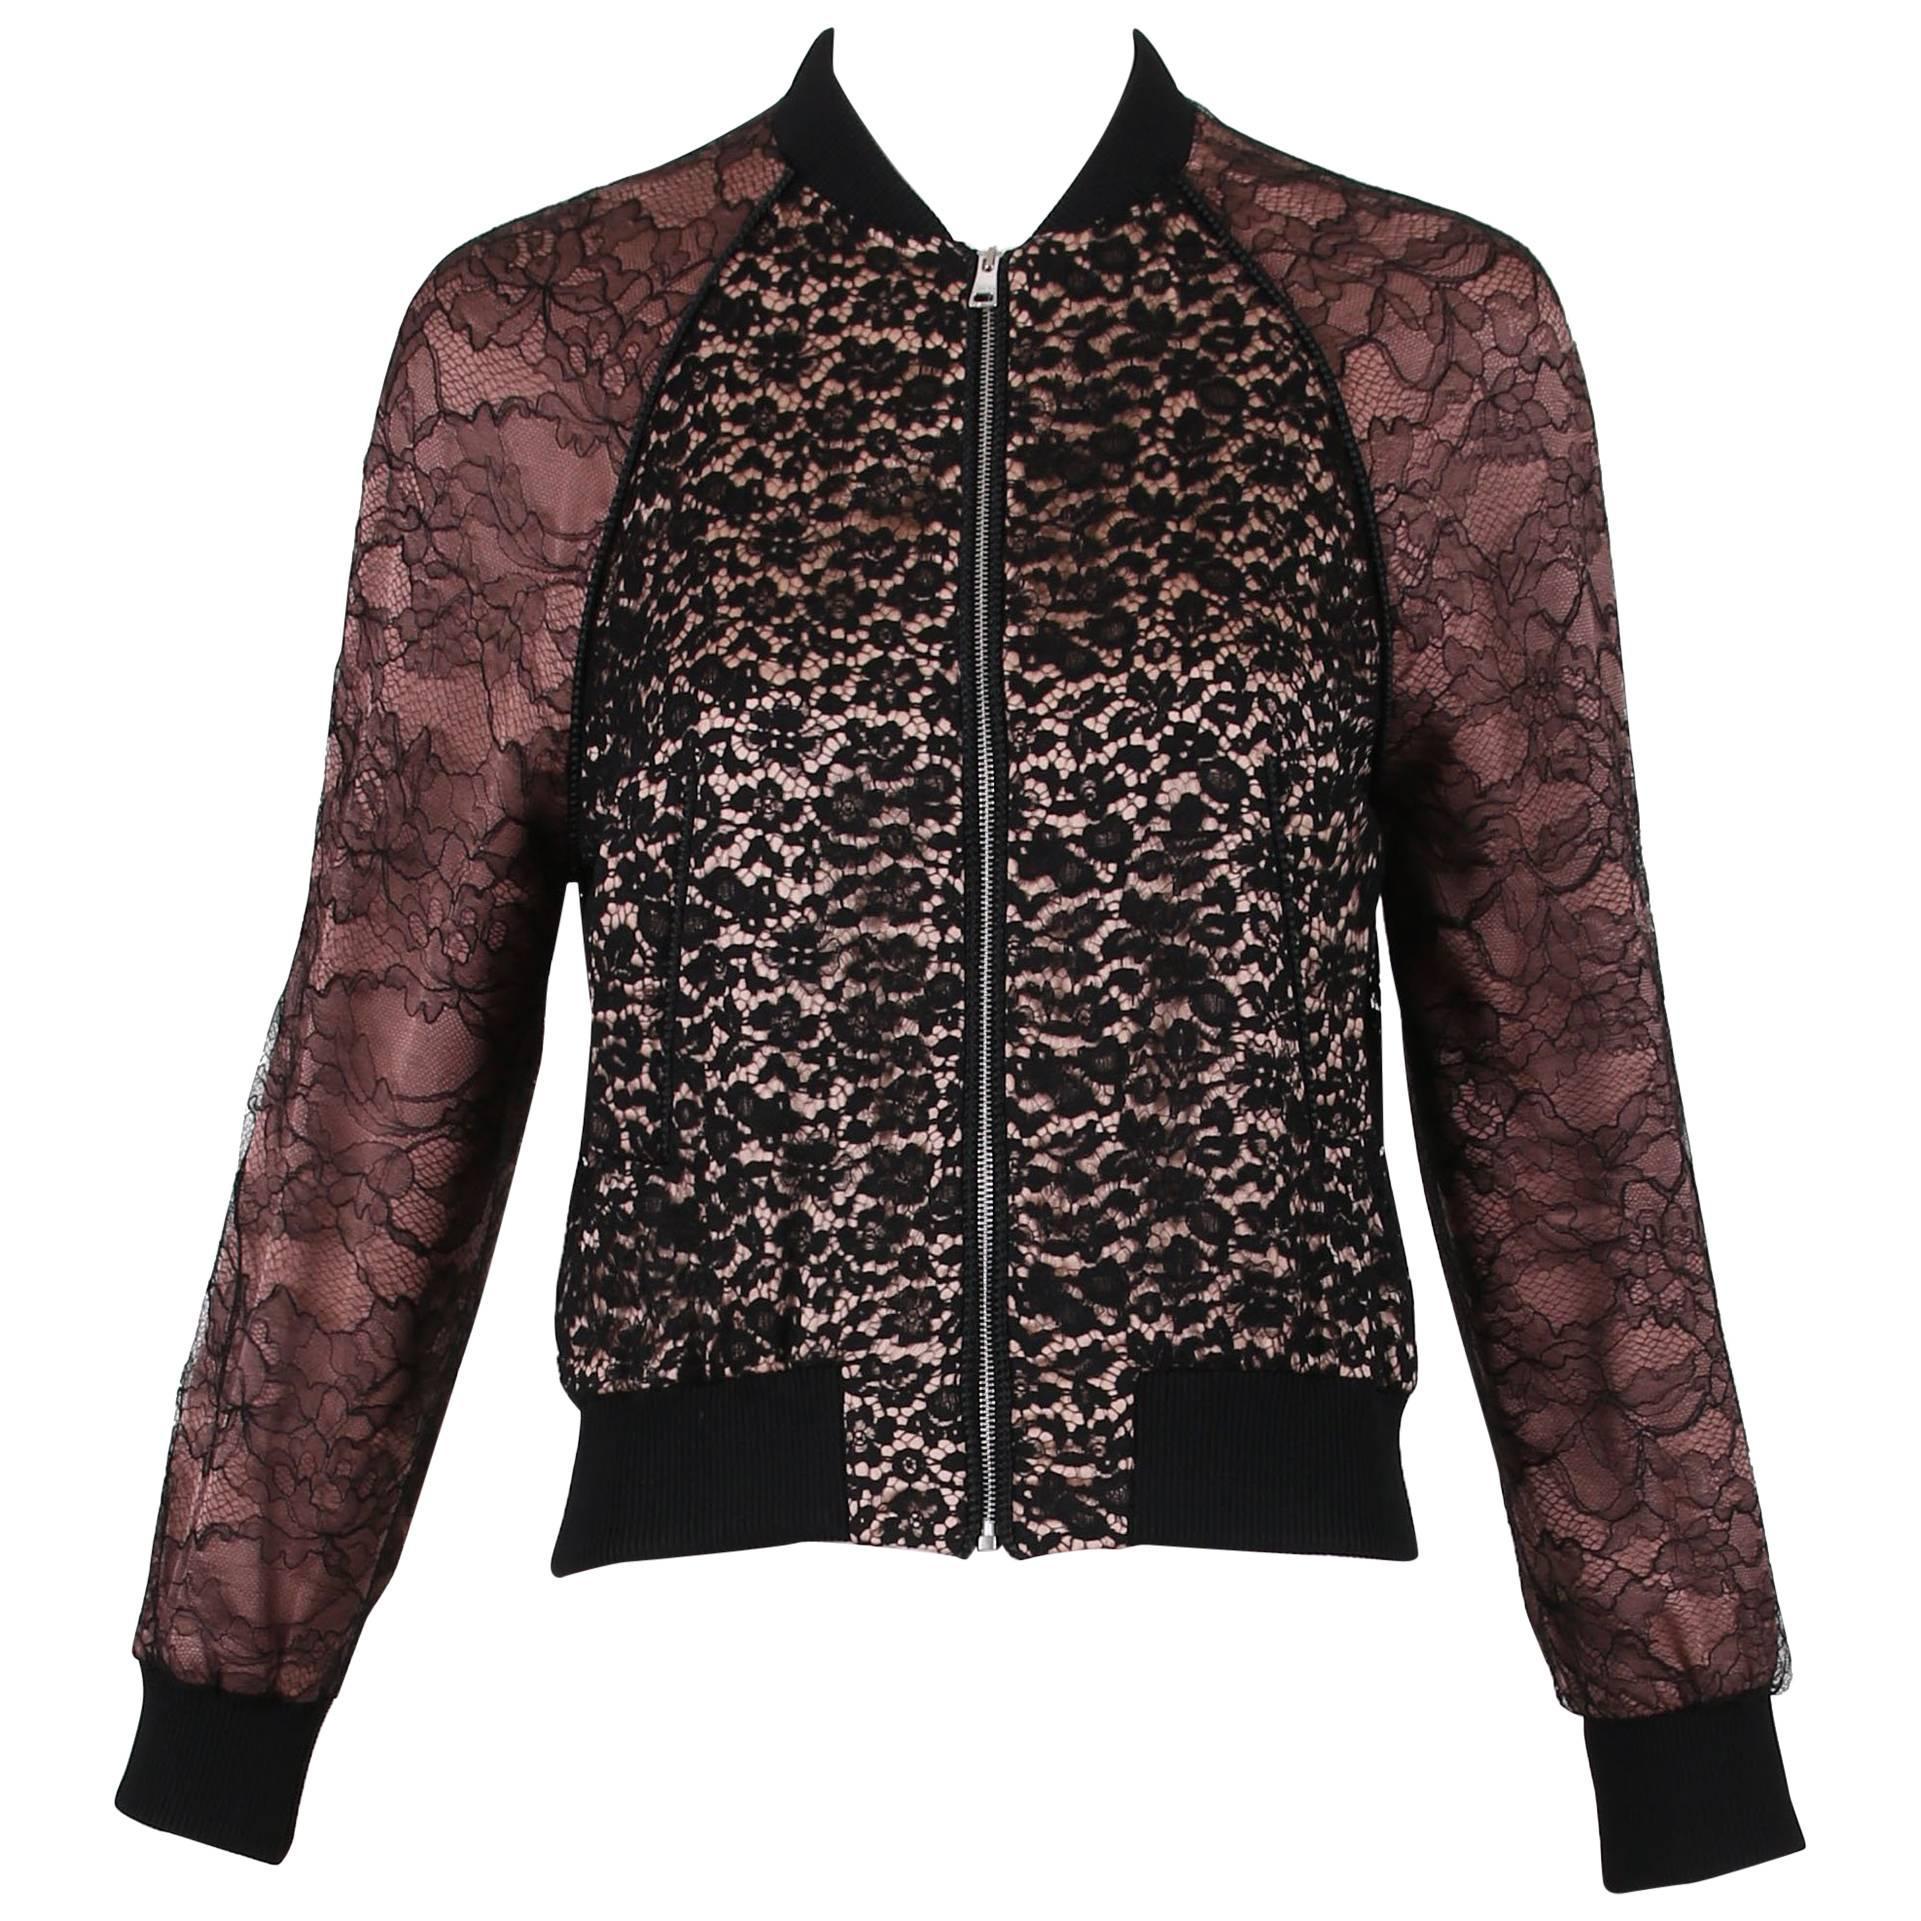 2016 Gucci Black & Dusty Rose Lace Bomber Jacket